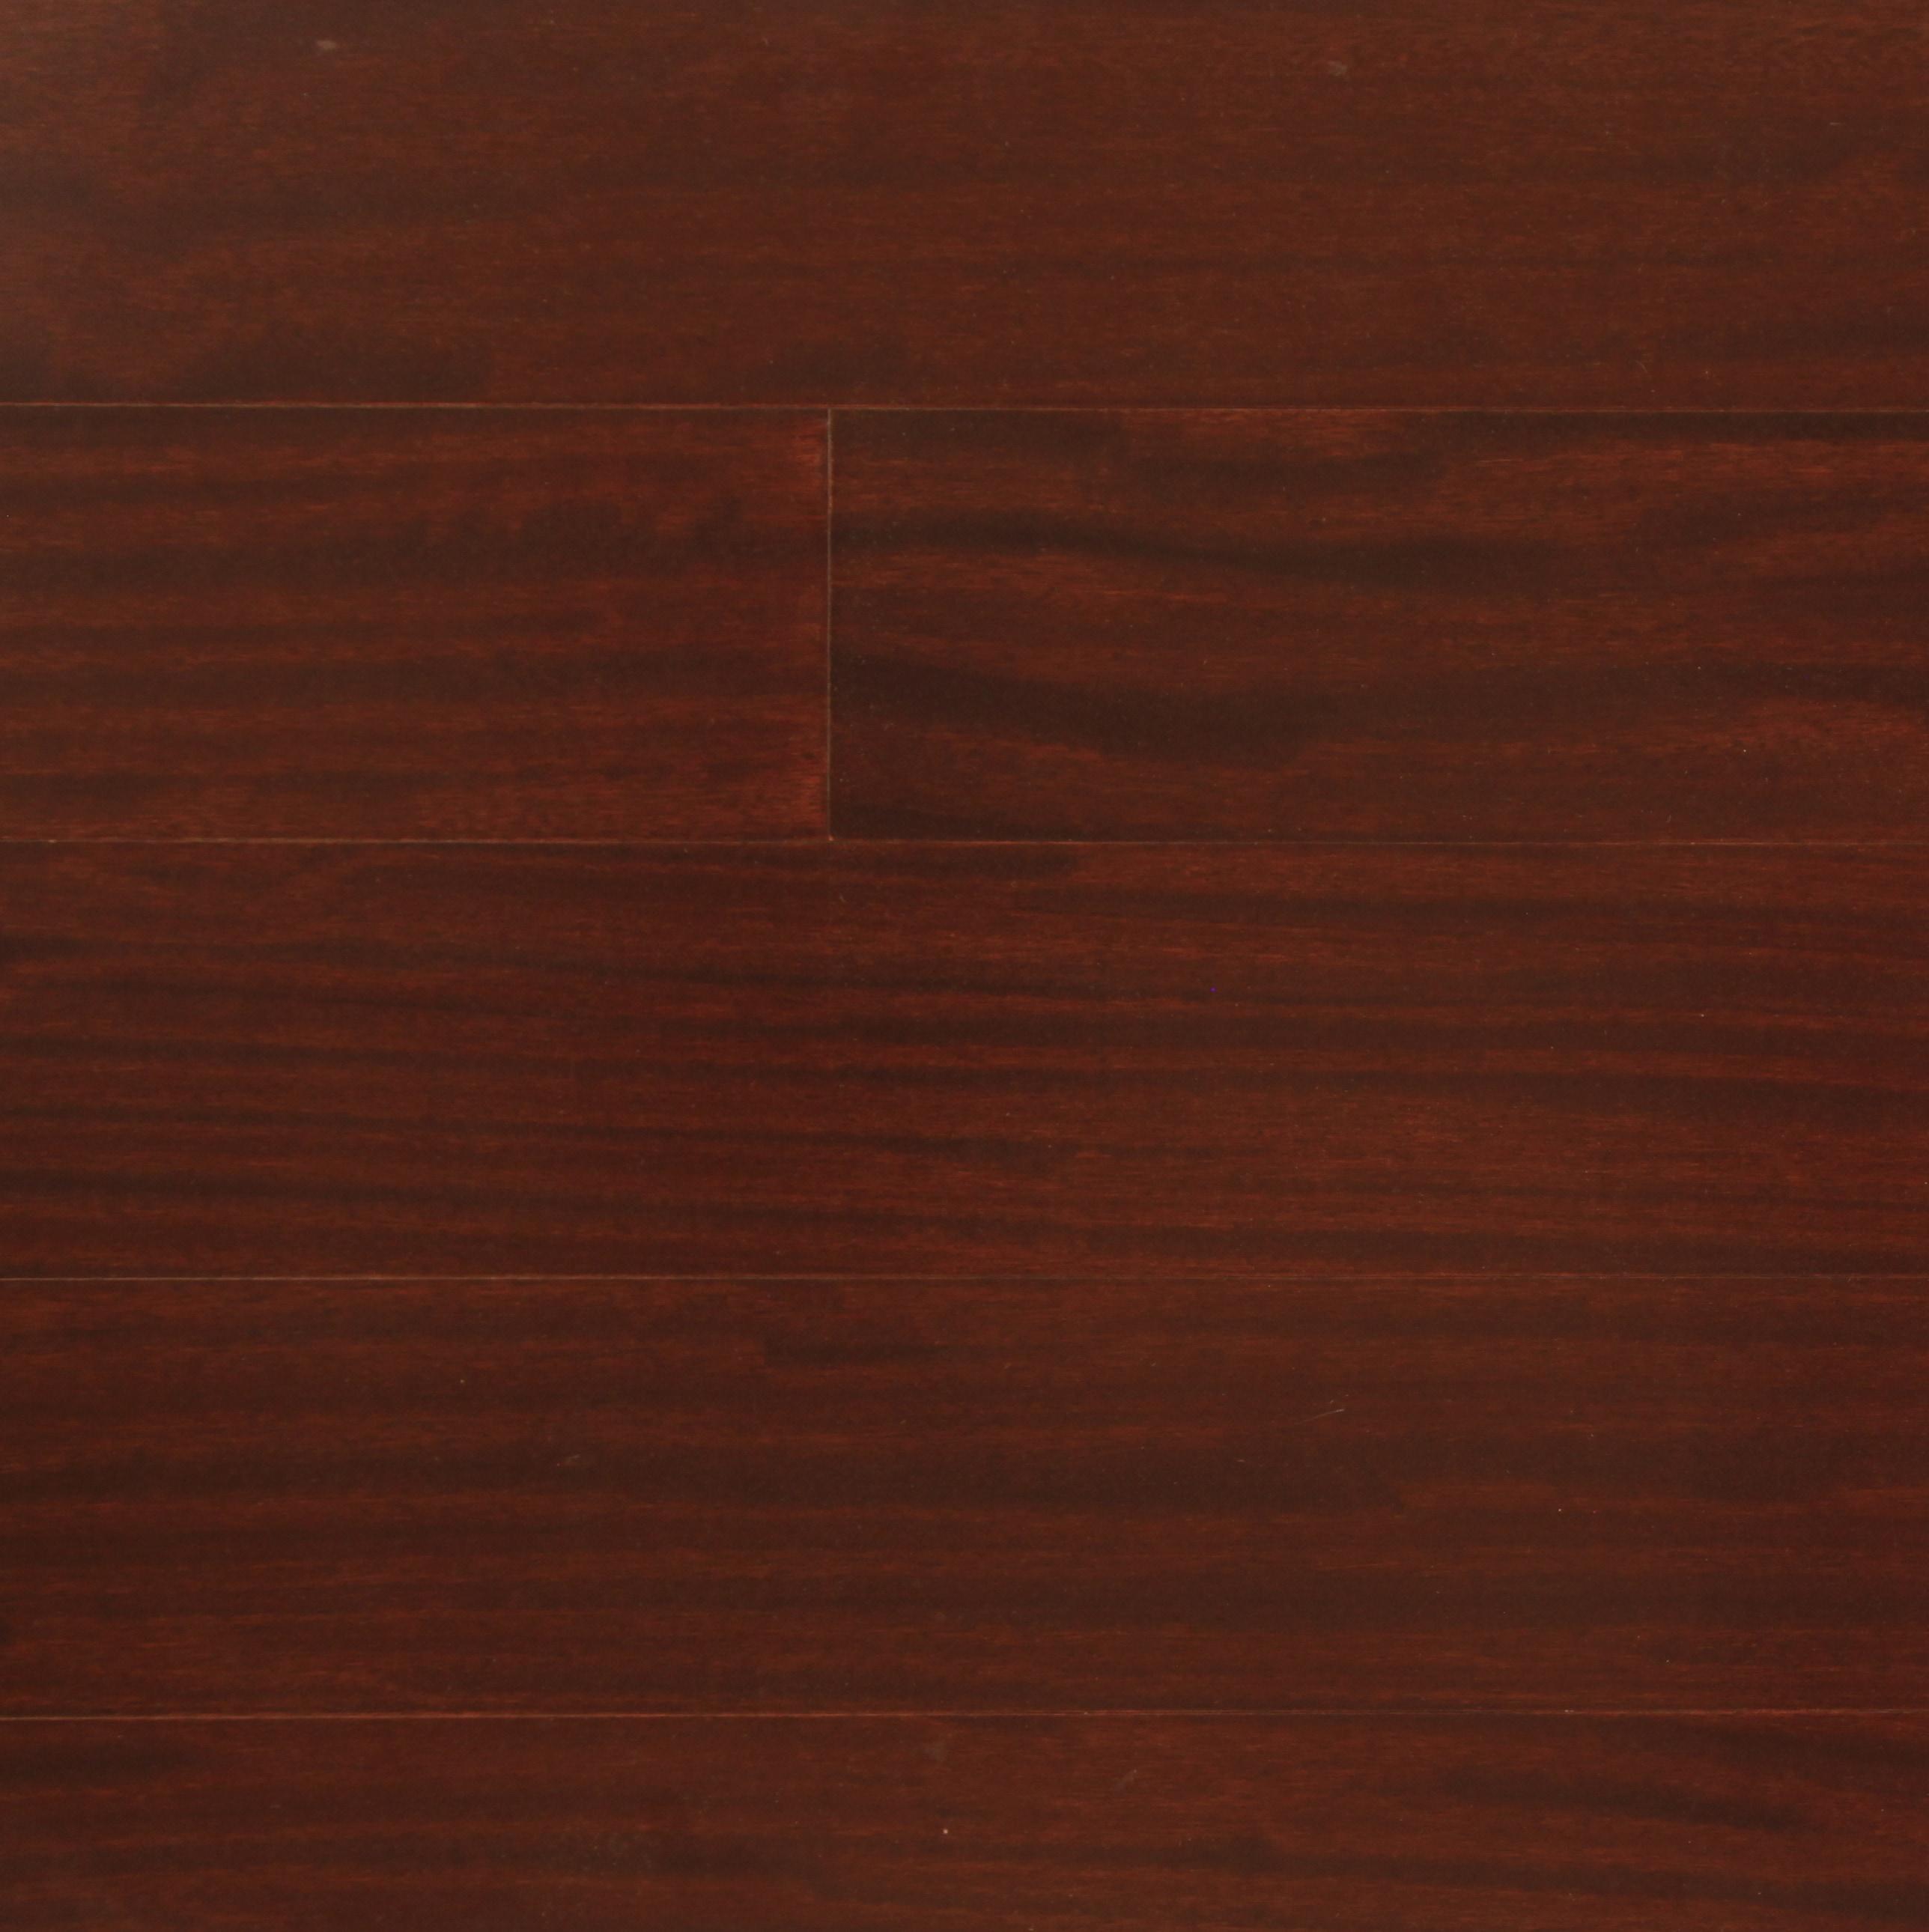 "Burgundy MHT-29-XXX / Sapele / A / 5/16"" x 5"" x 4ft / Prefinished-UV Engineered Hardwood Flooring - African Heritage Collection 0"